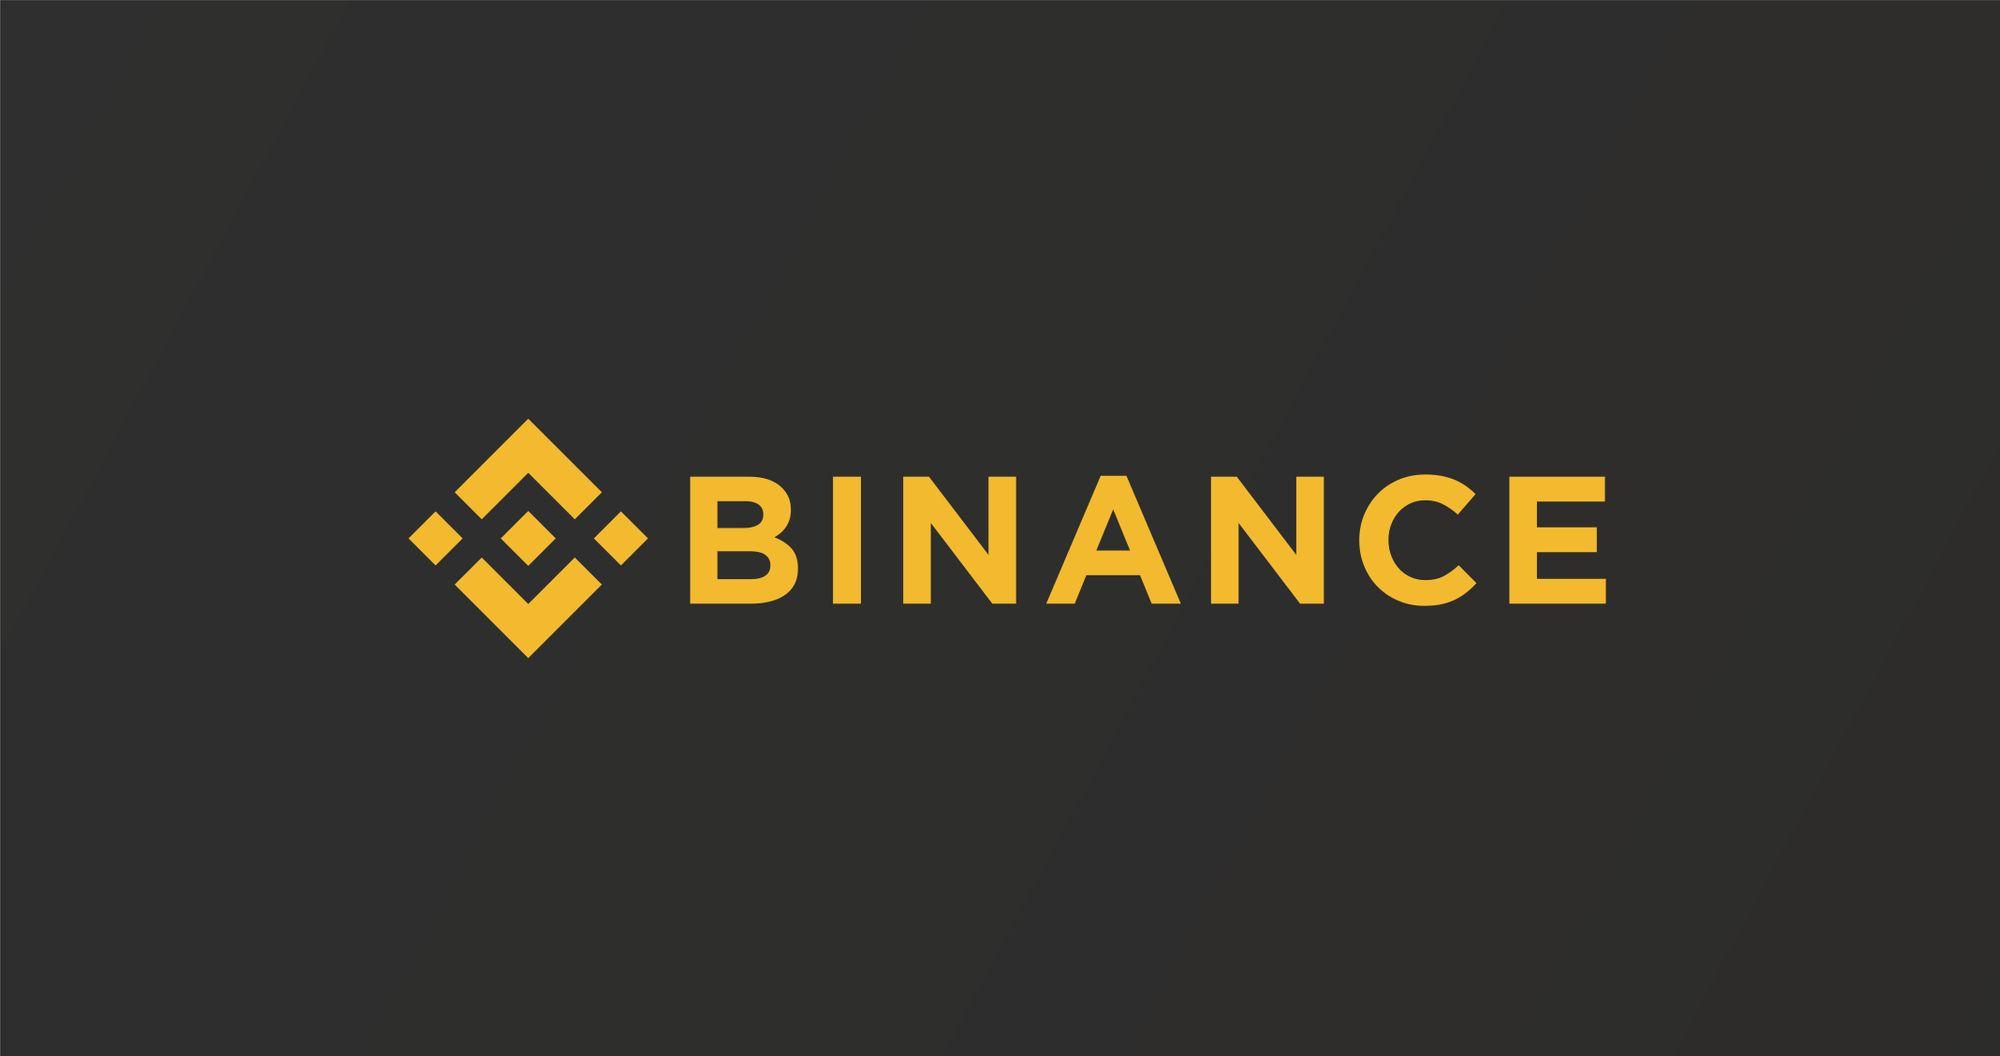 как удалить субаккаунт Binance